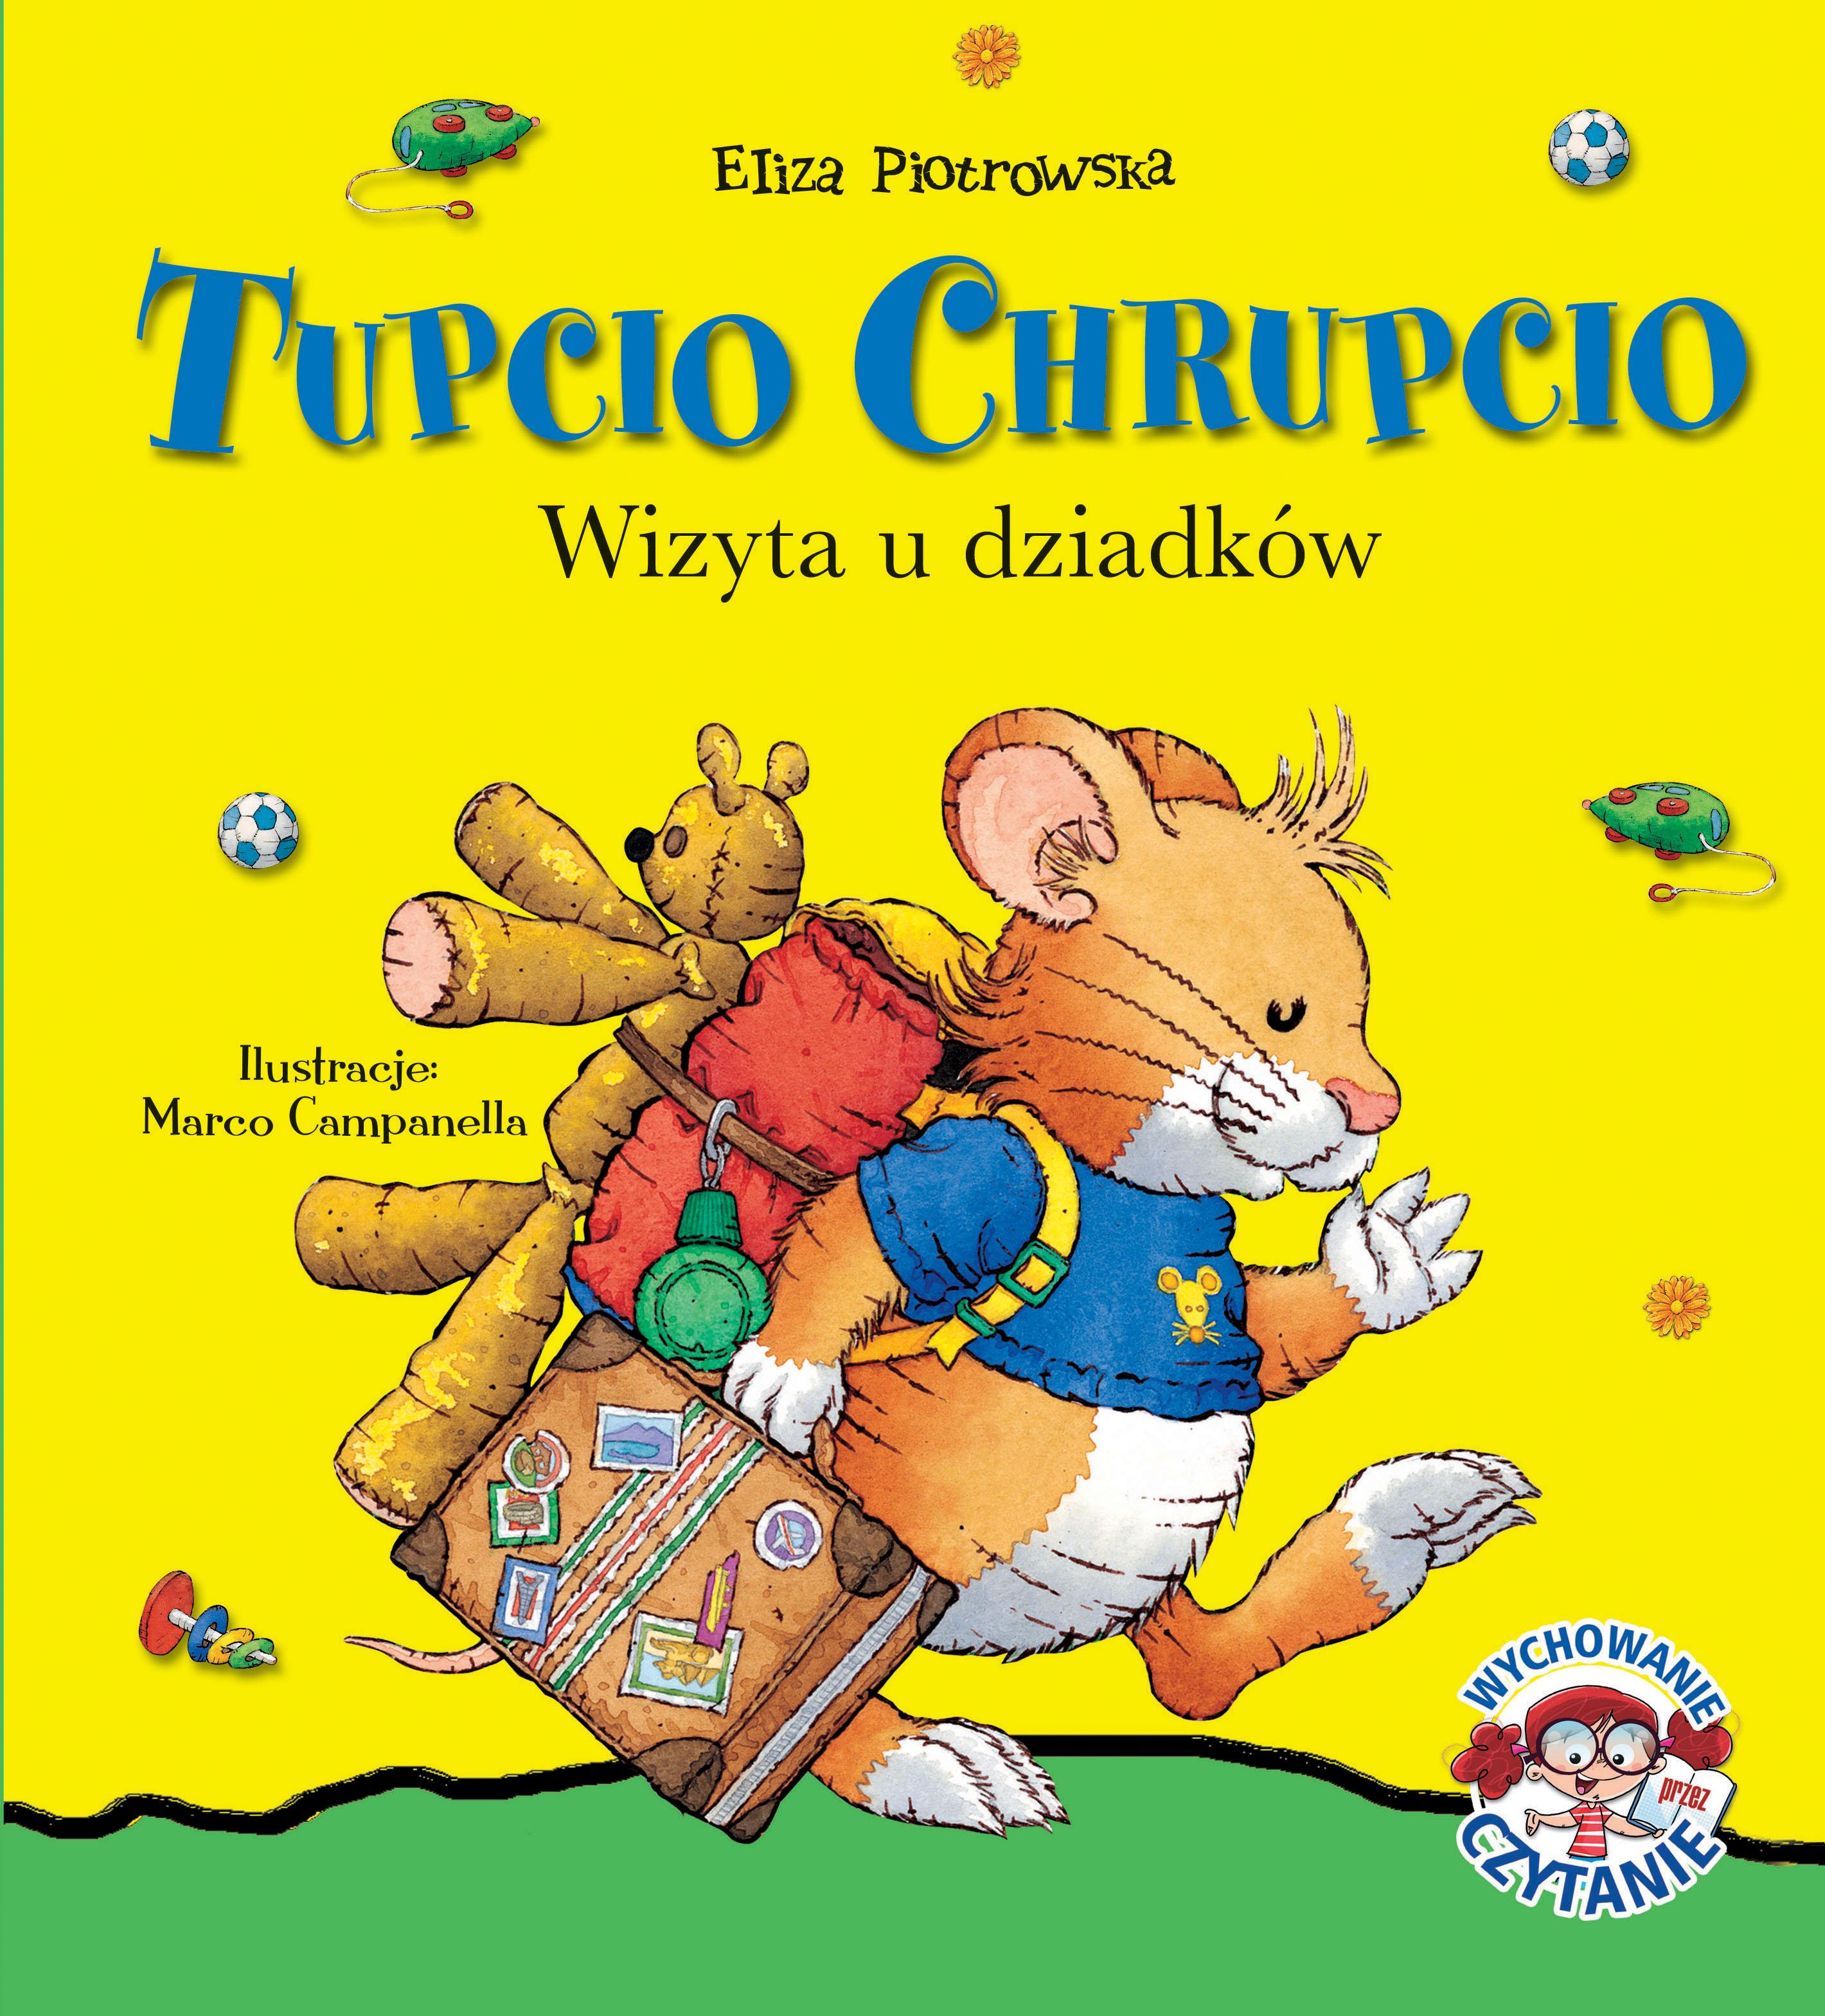 Tupcio Chrupcio. Wizyta u dziadków